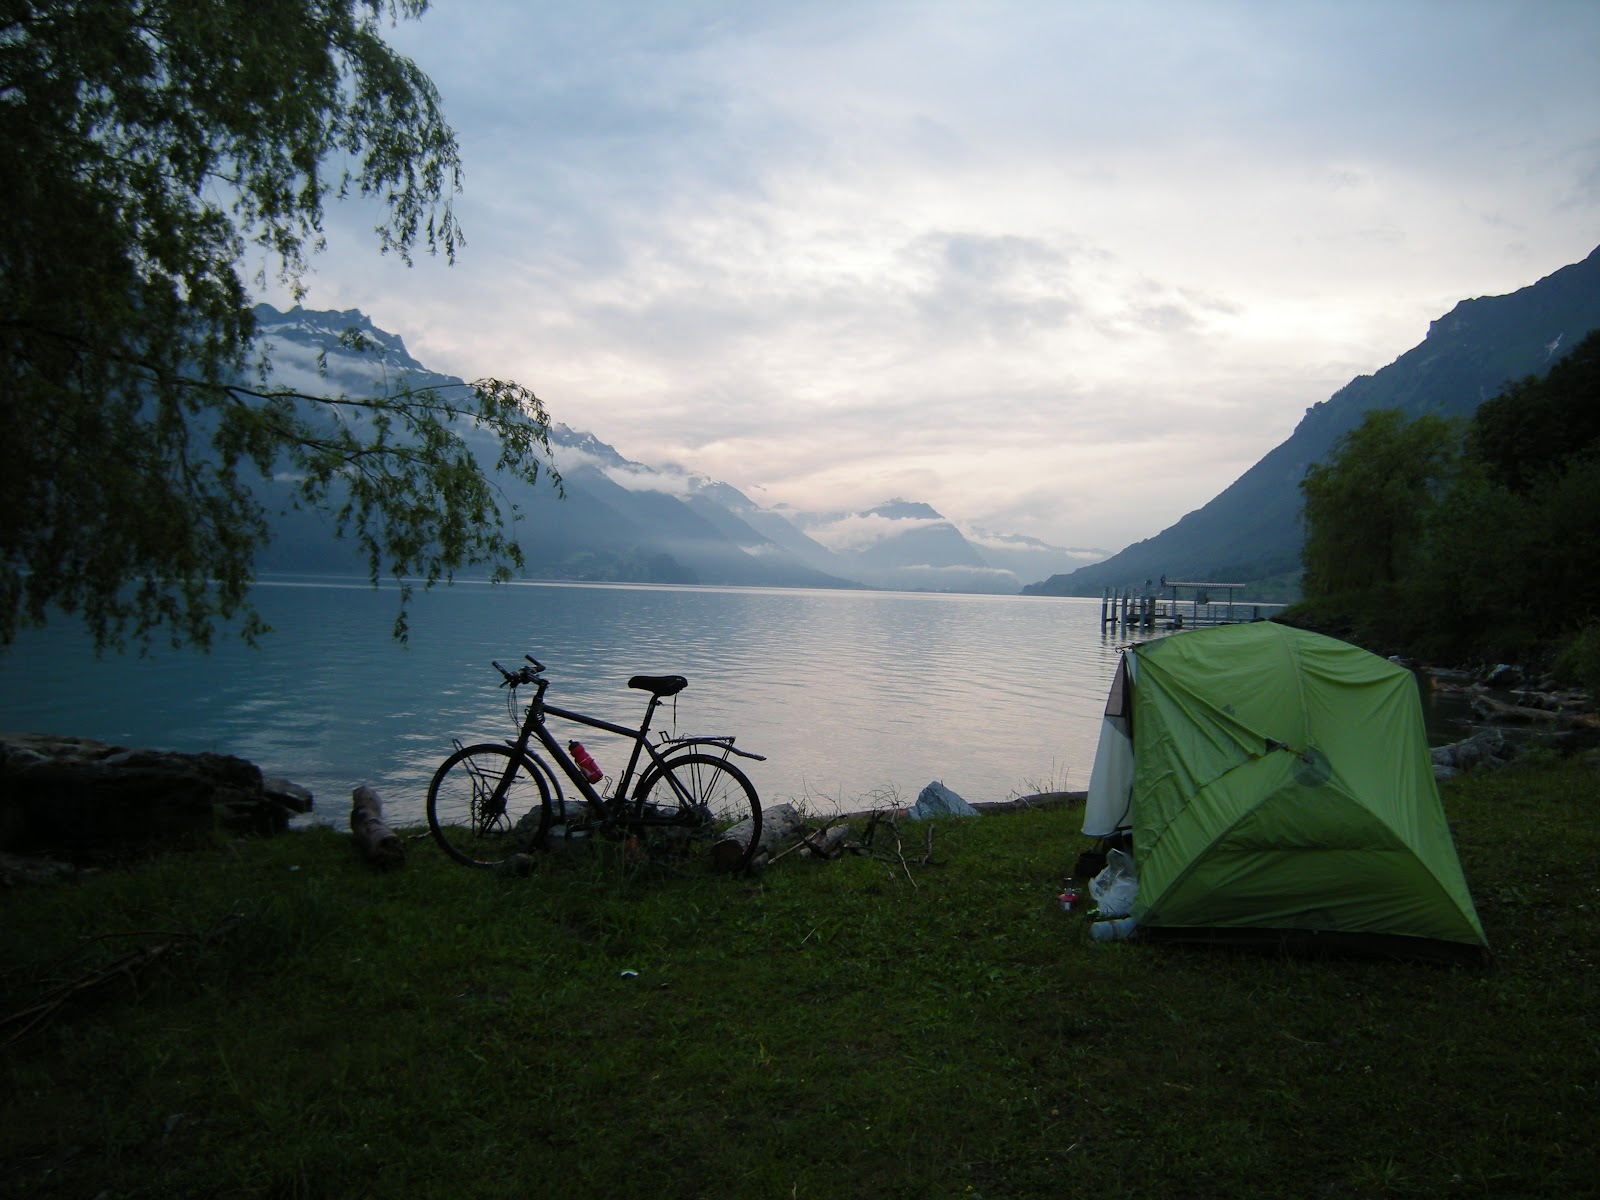 Bike for africa nuit premi re lac de brienz schweiz - Lac de brienz ...